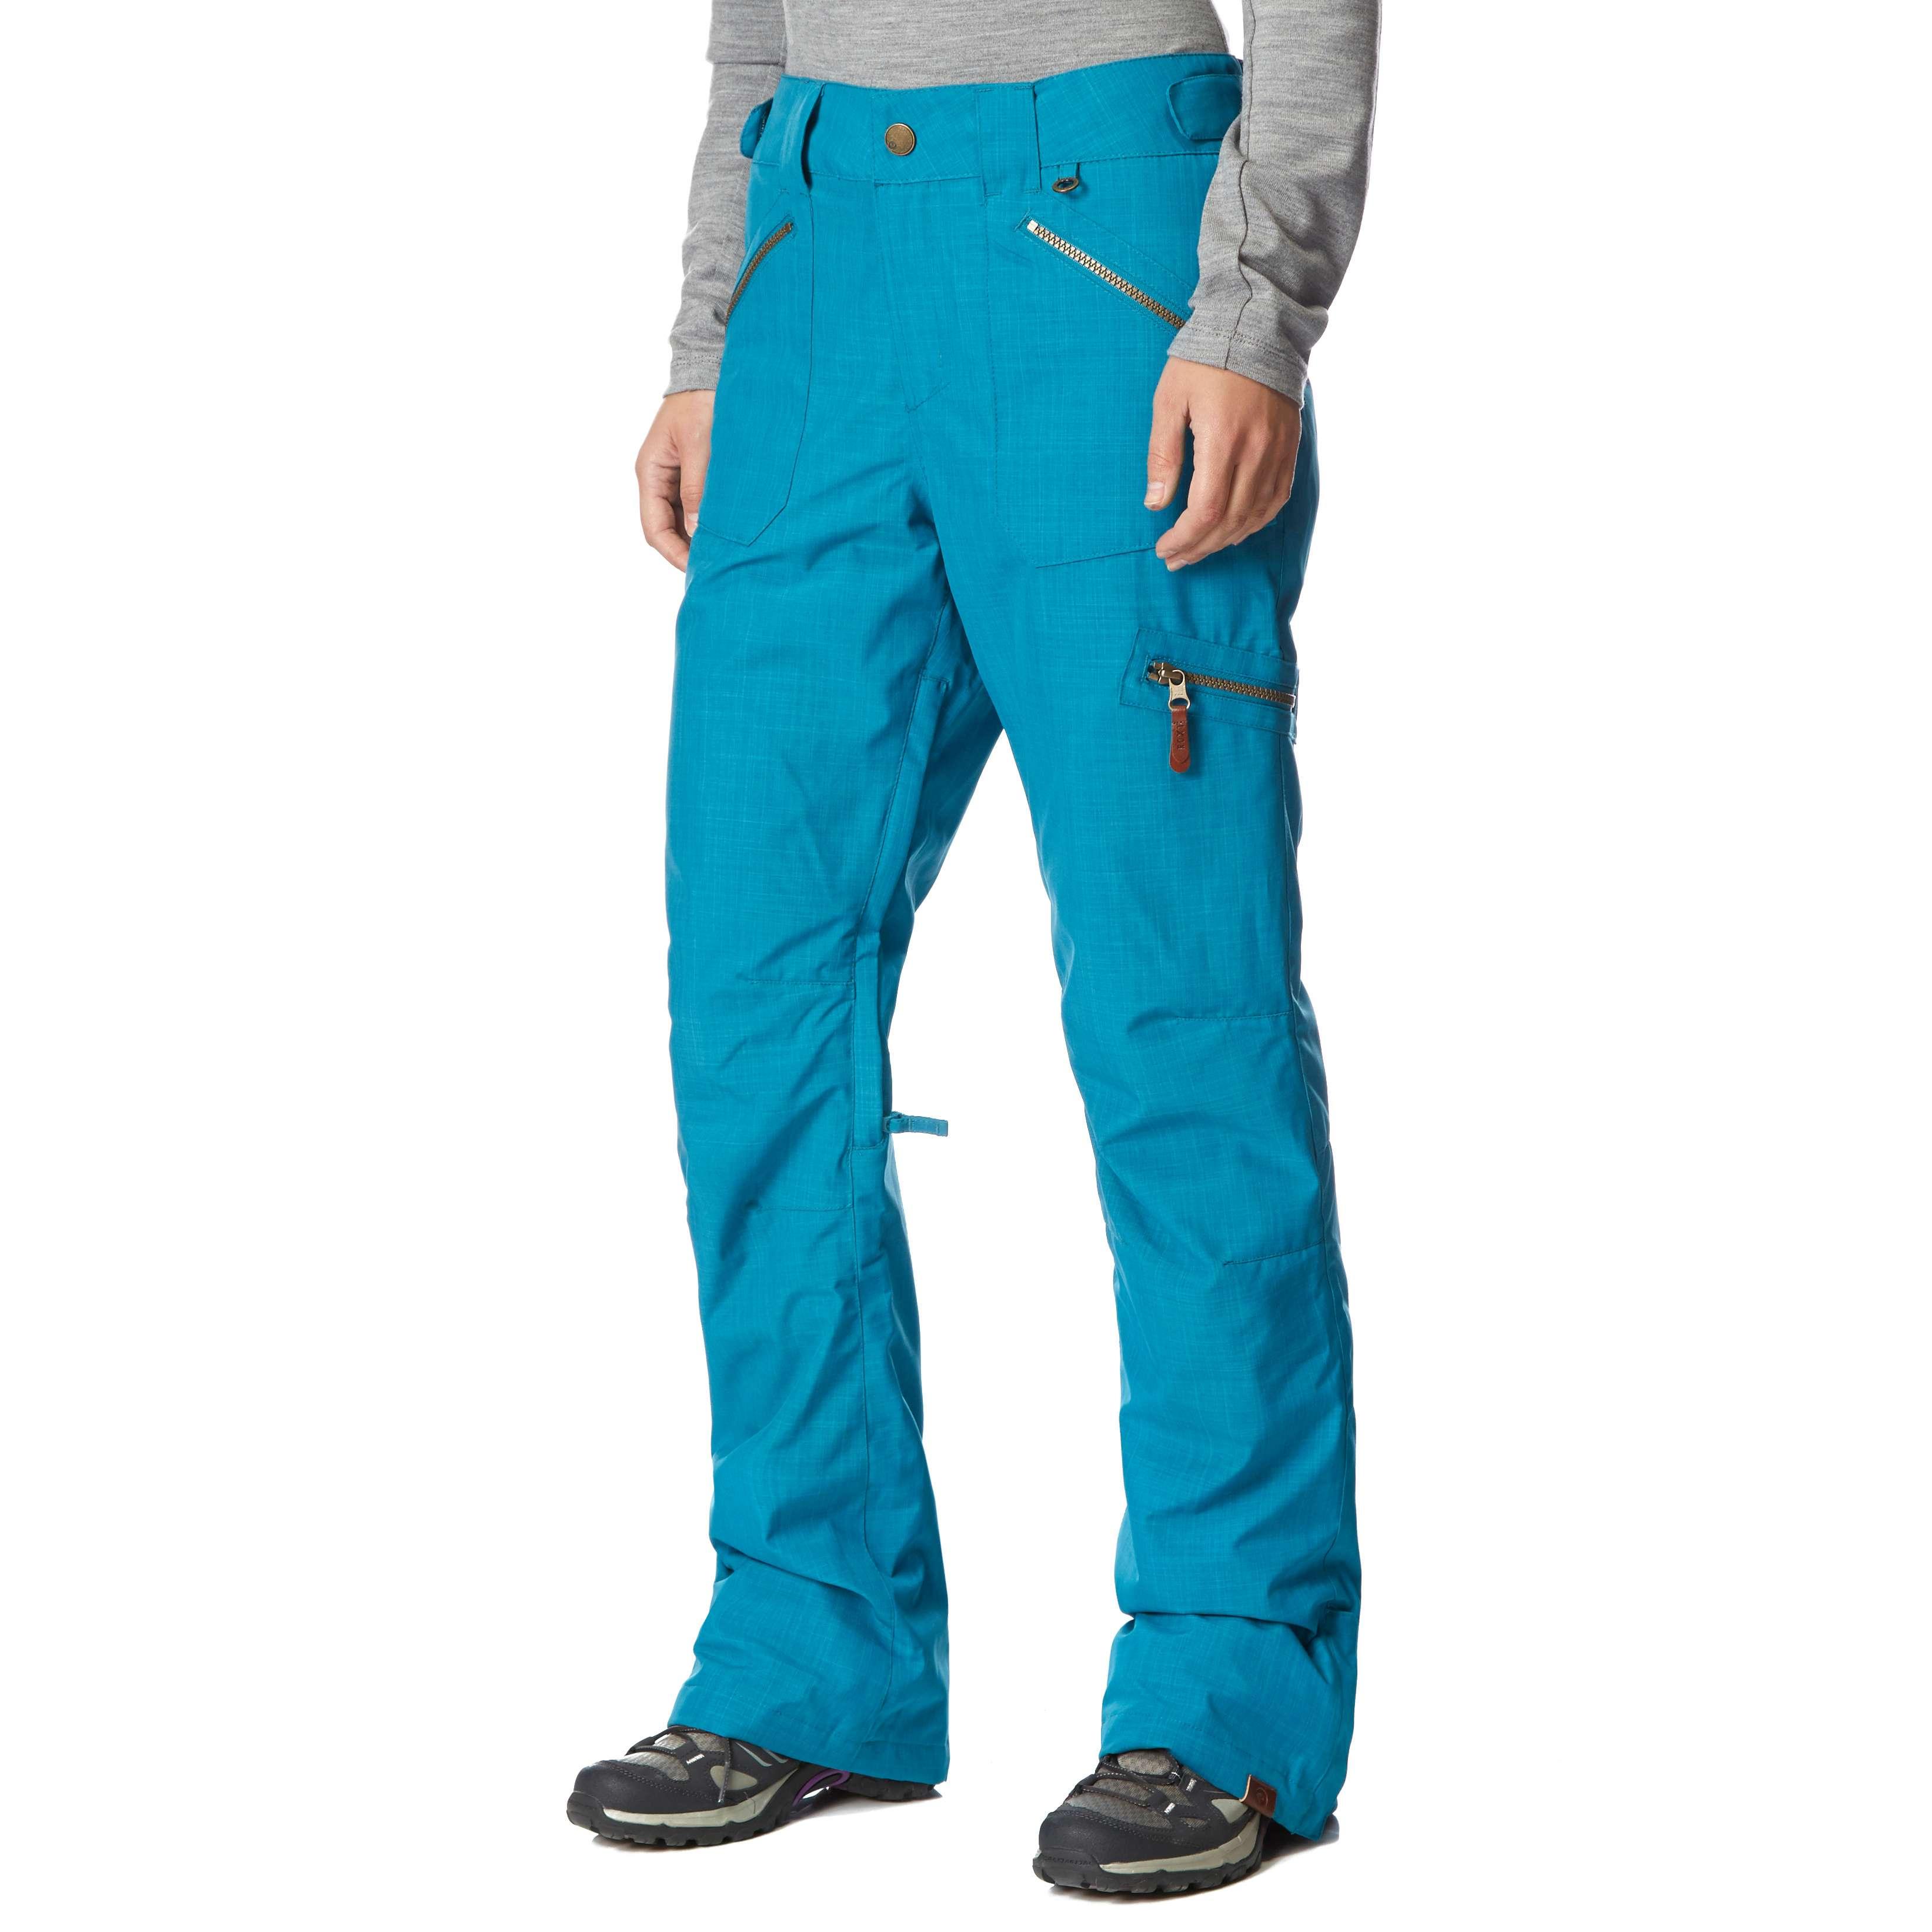 ROXY Women's Nadia Snowsports Pants